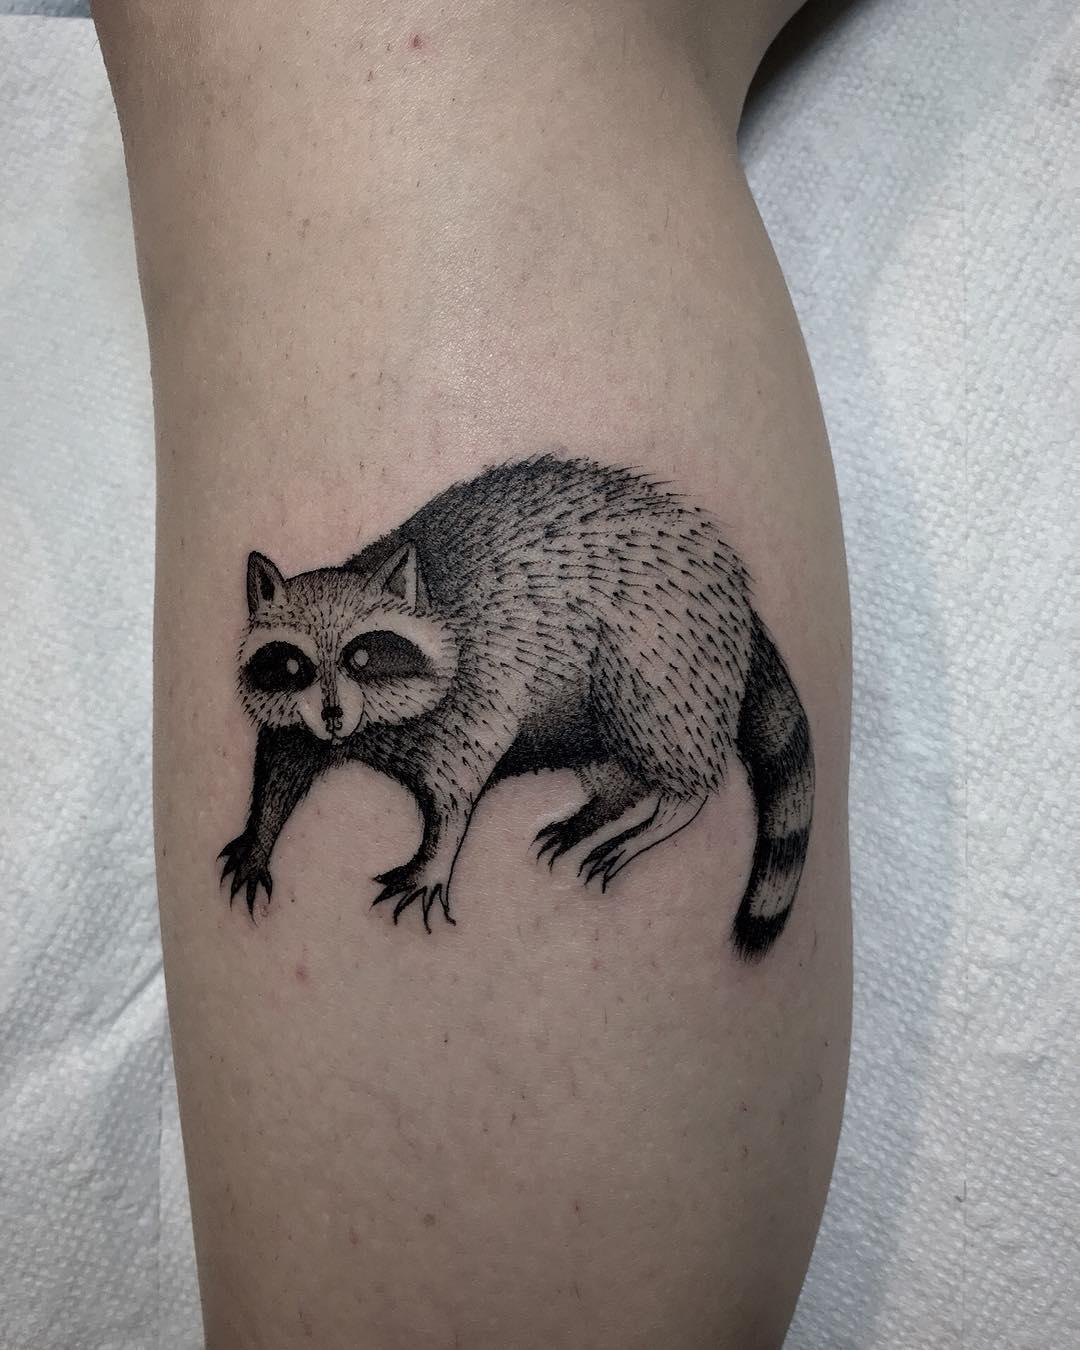 Raccoon by @justinoliviertattoo